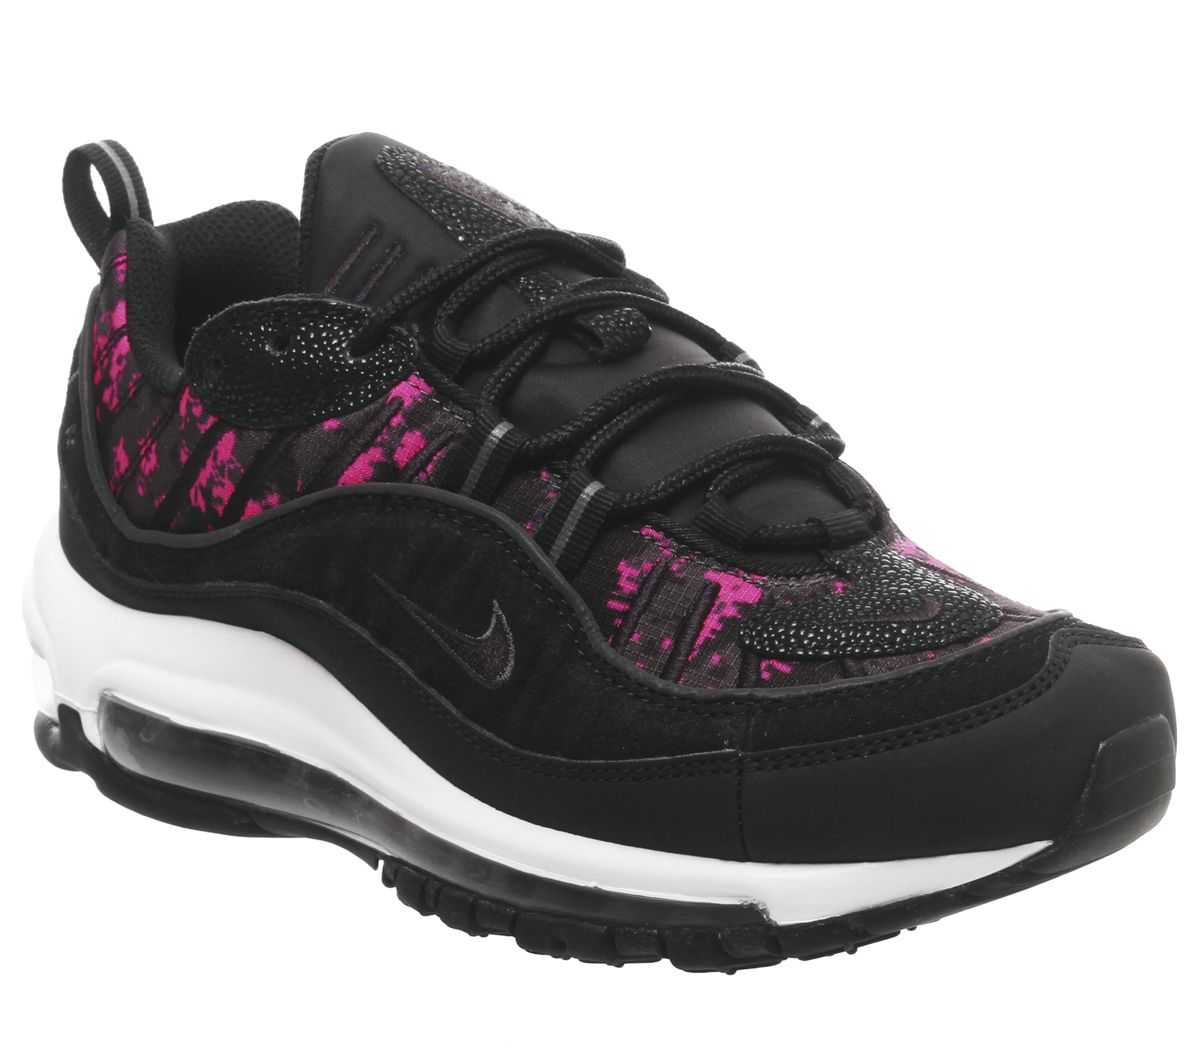 hot sale online ecb46 8bf37 Nike Air Max 98 Trainers Black Black Hyper Pink Camo Snake - Animal ...